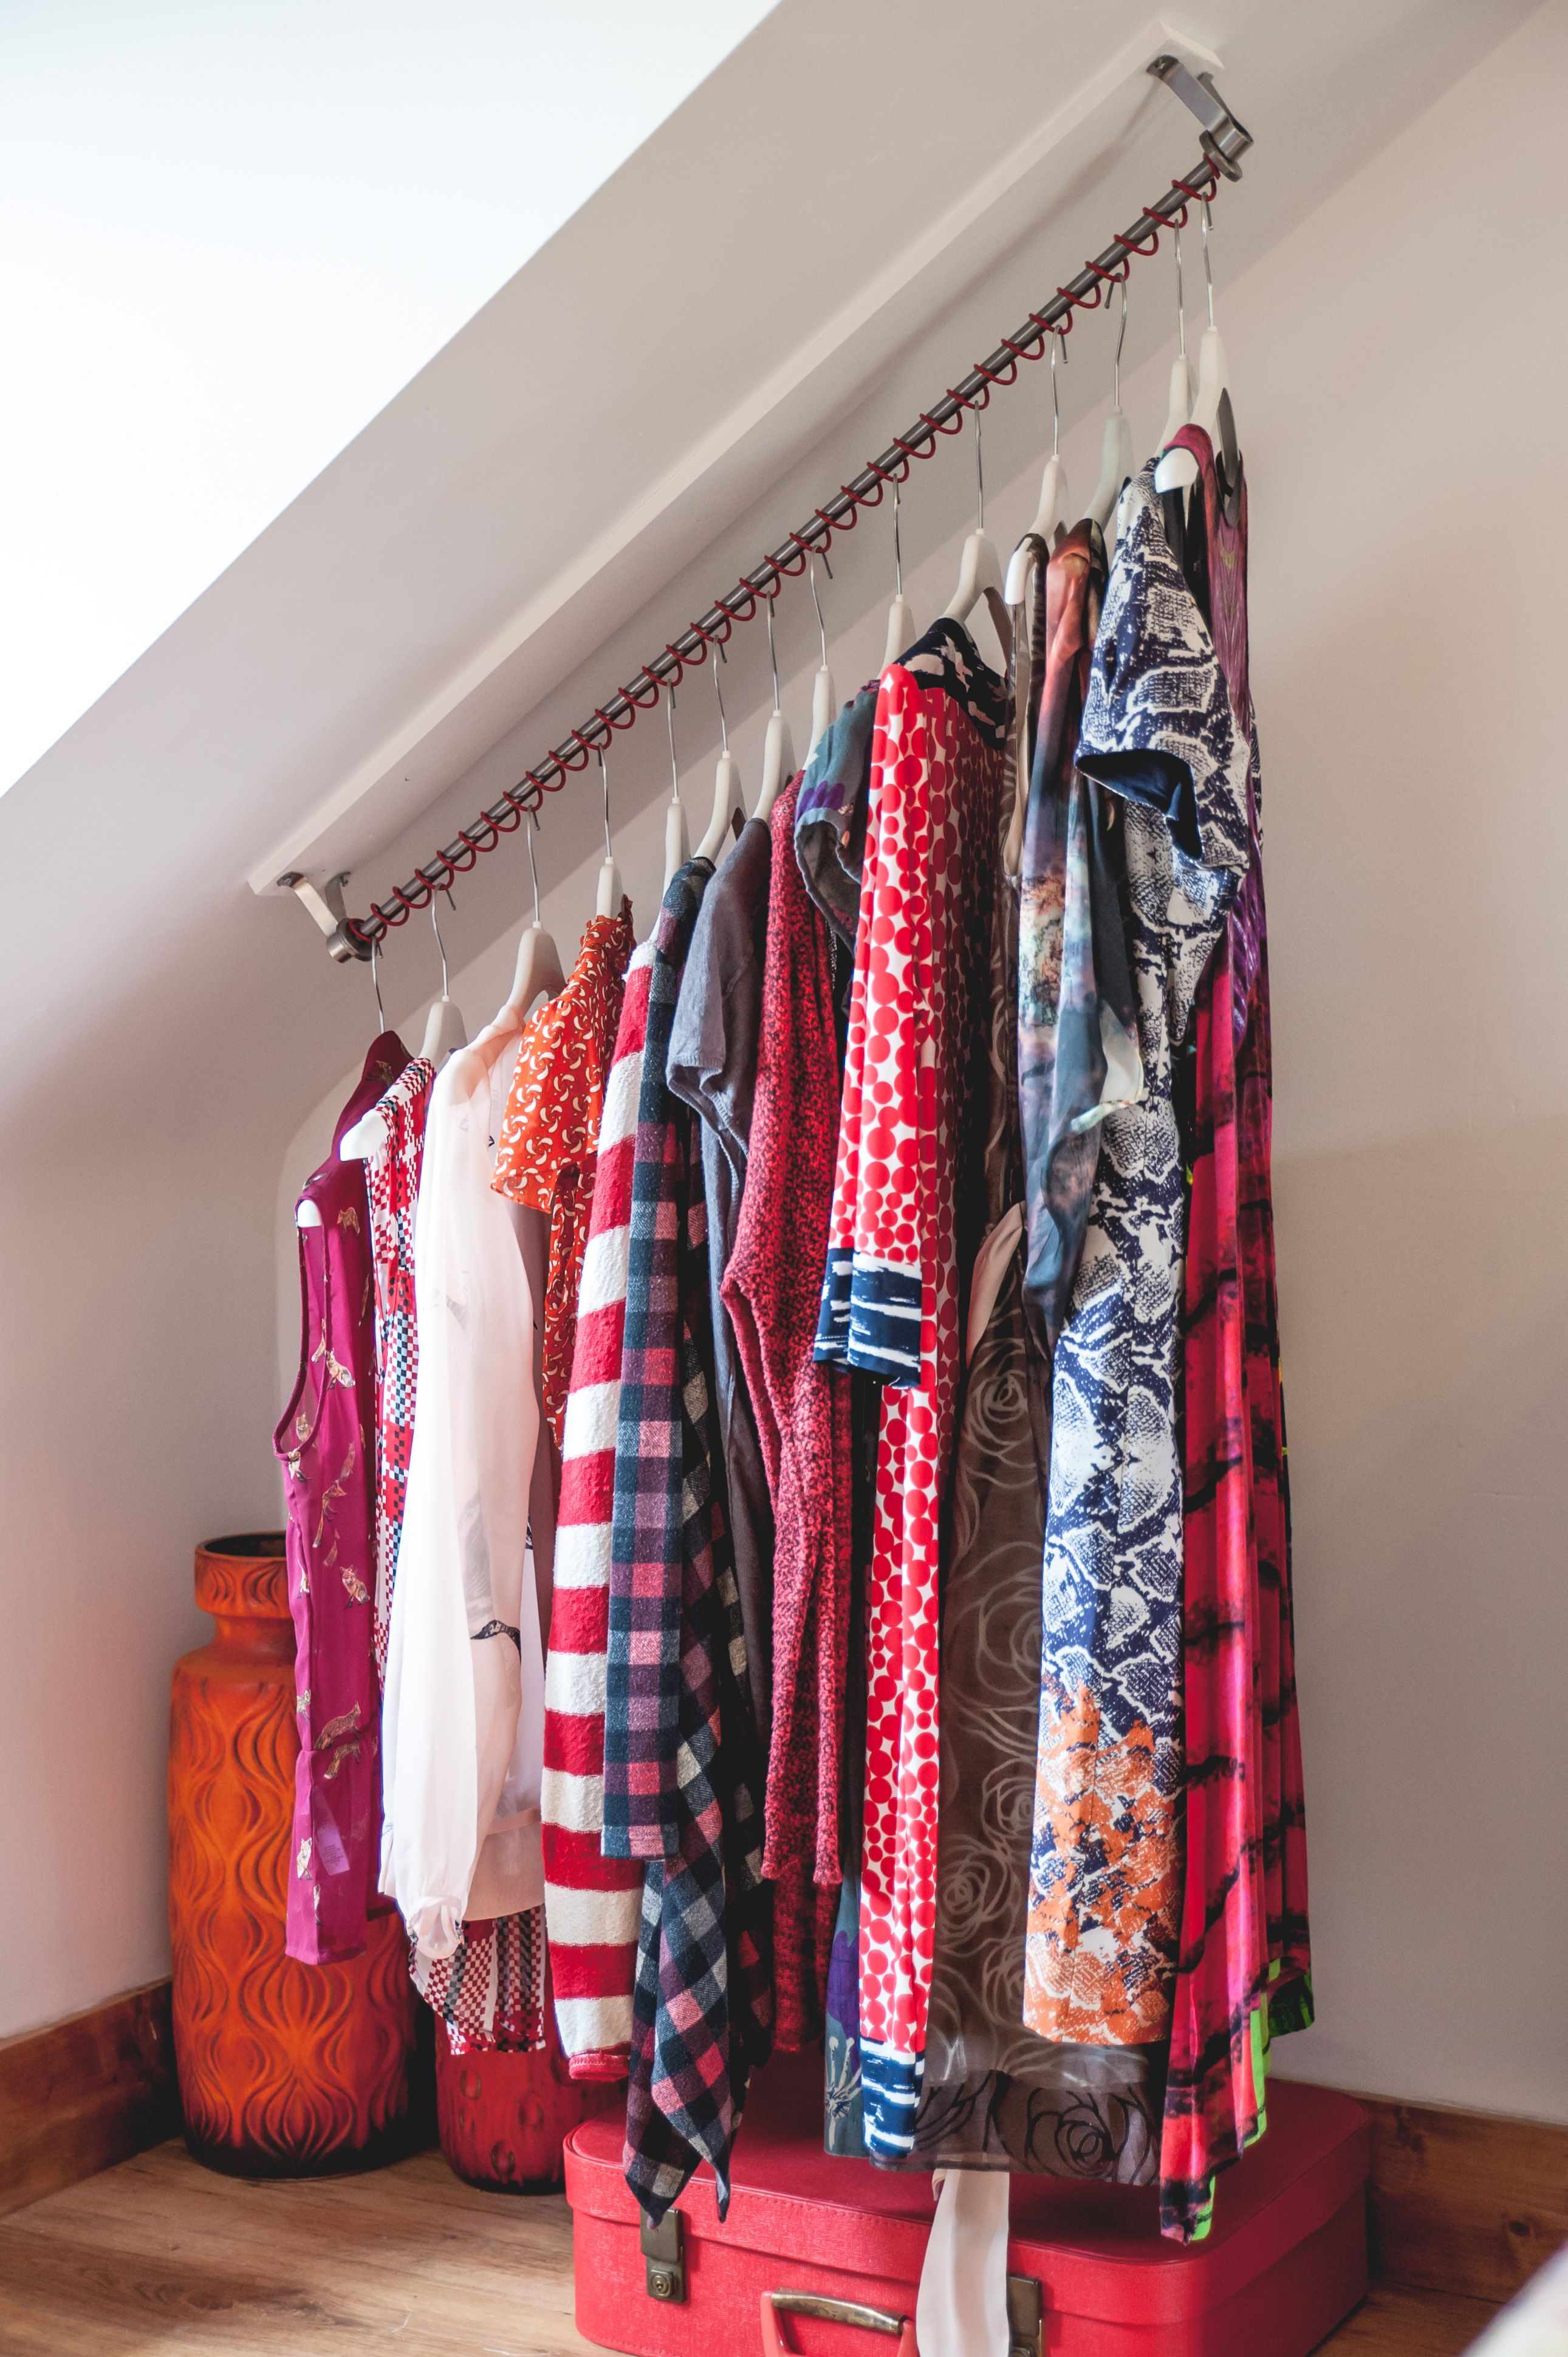 Attic Bedroom Ideas Angled Ceilings Decor